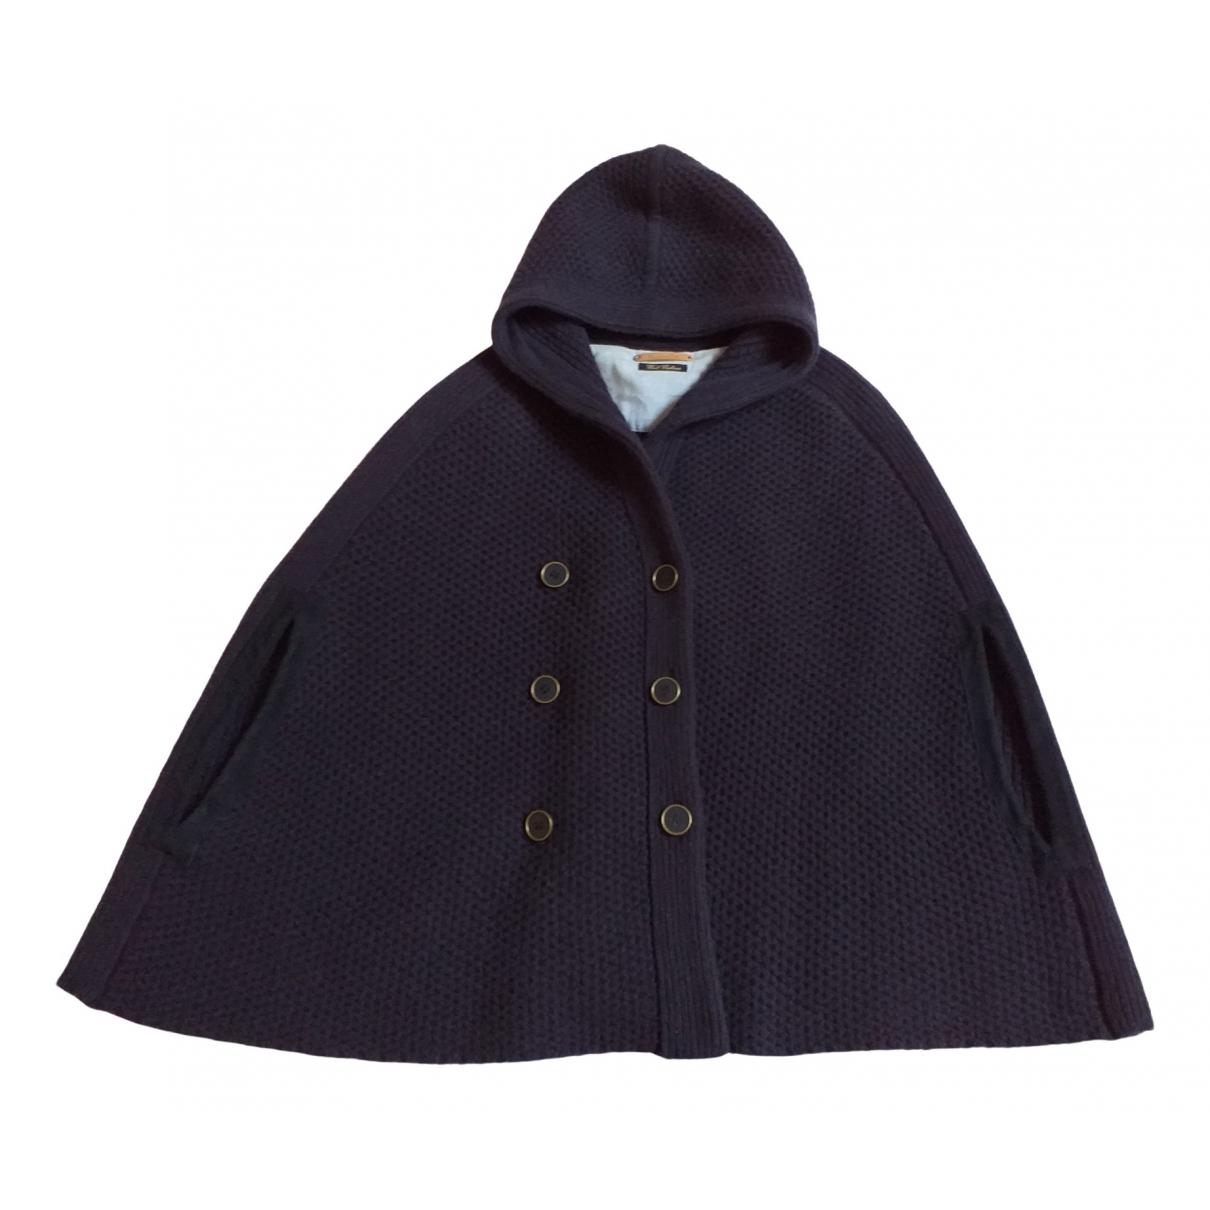 Massimo Dutti \N Navy Wool jacket for Women M International